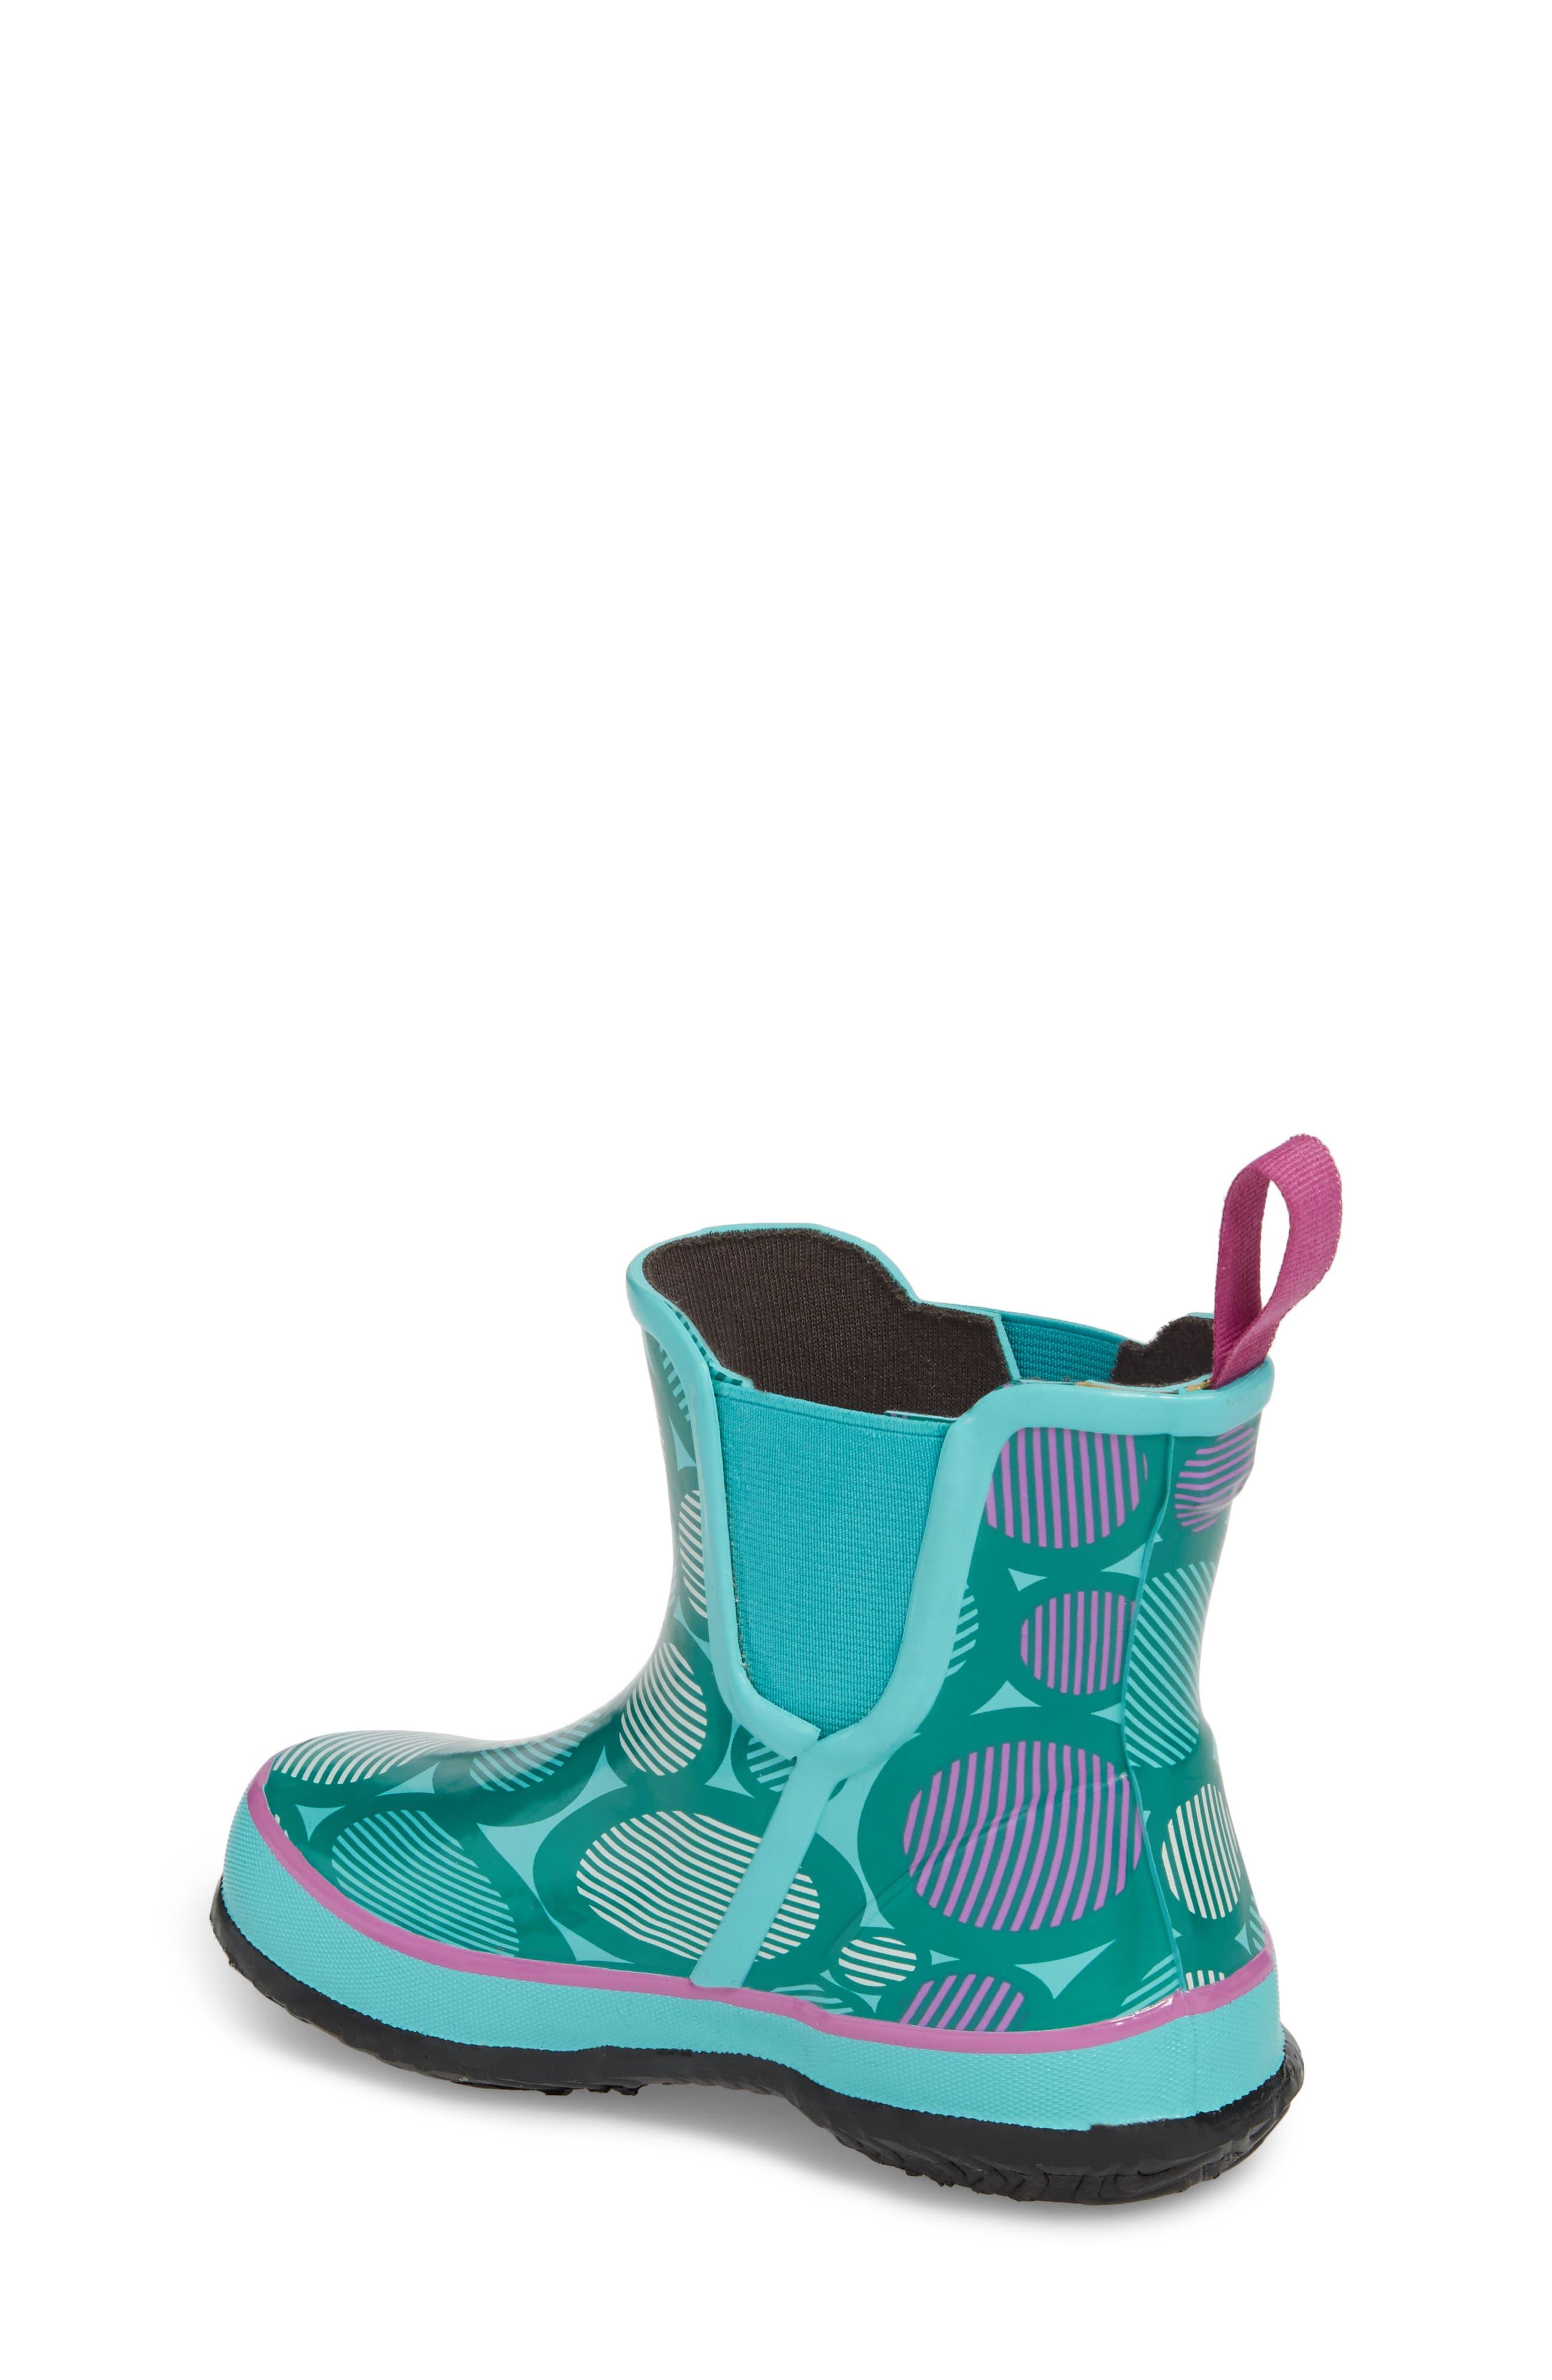 Baby, Walker & Toddler Bogs Boots Shoes | Nordstrom